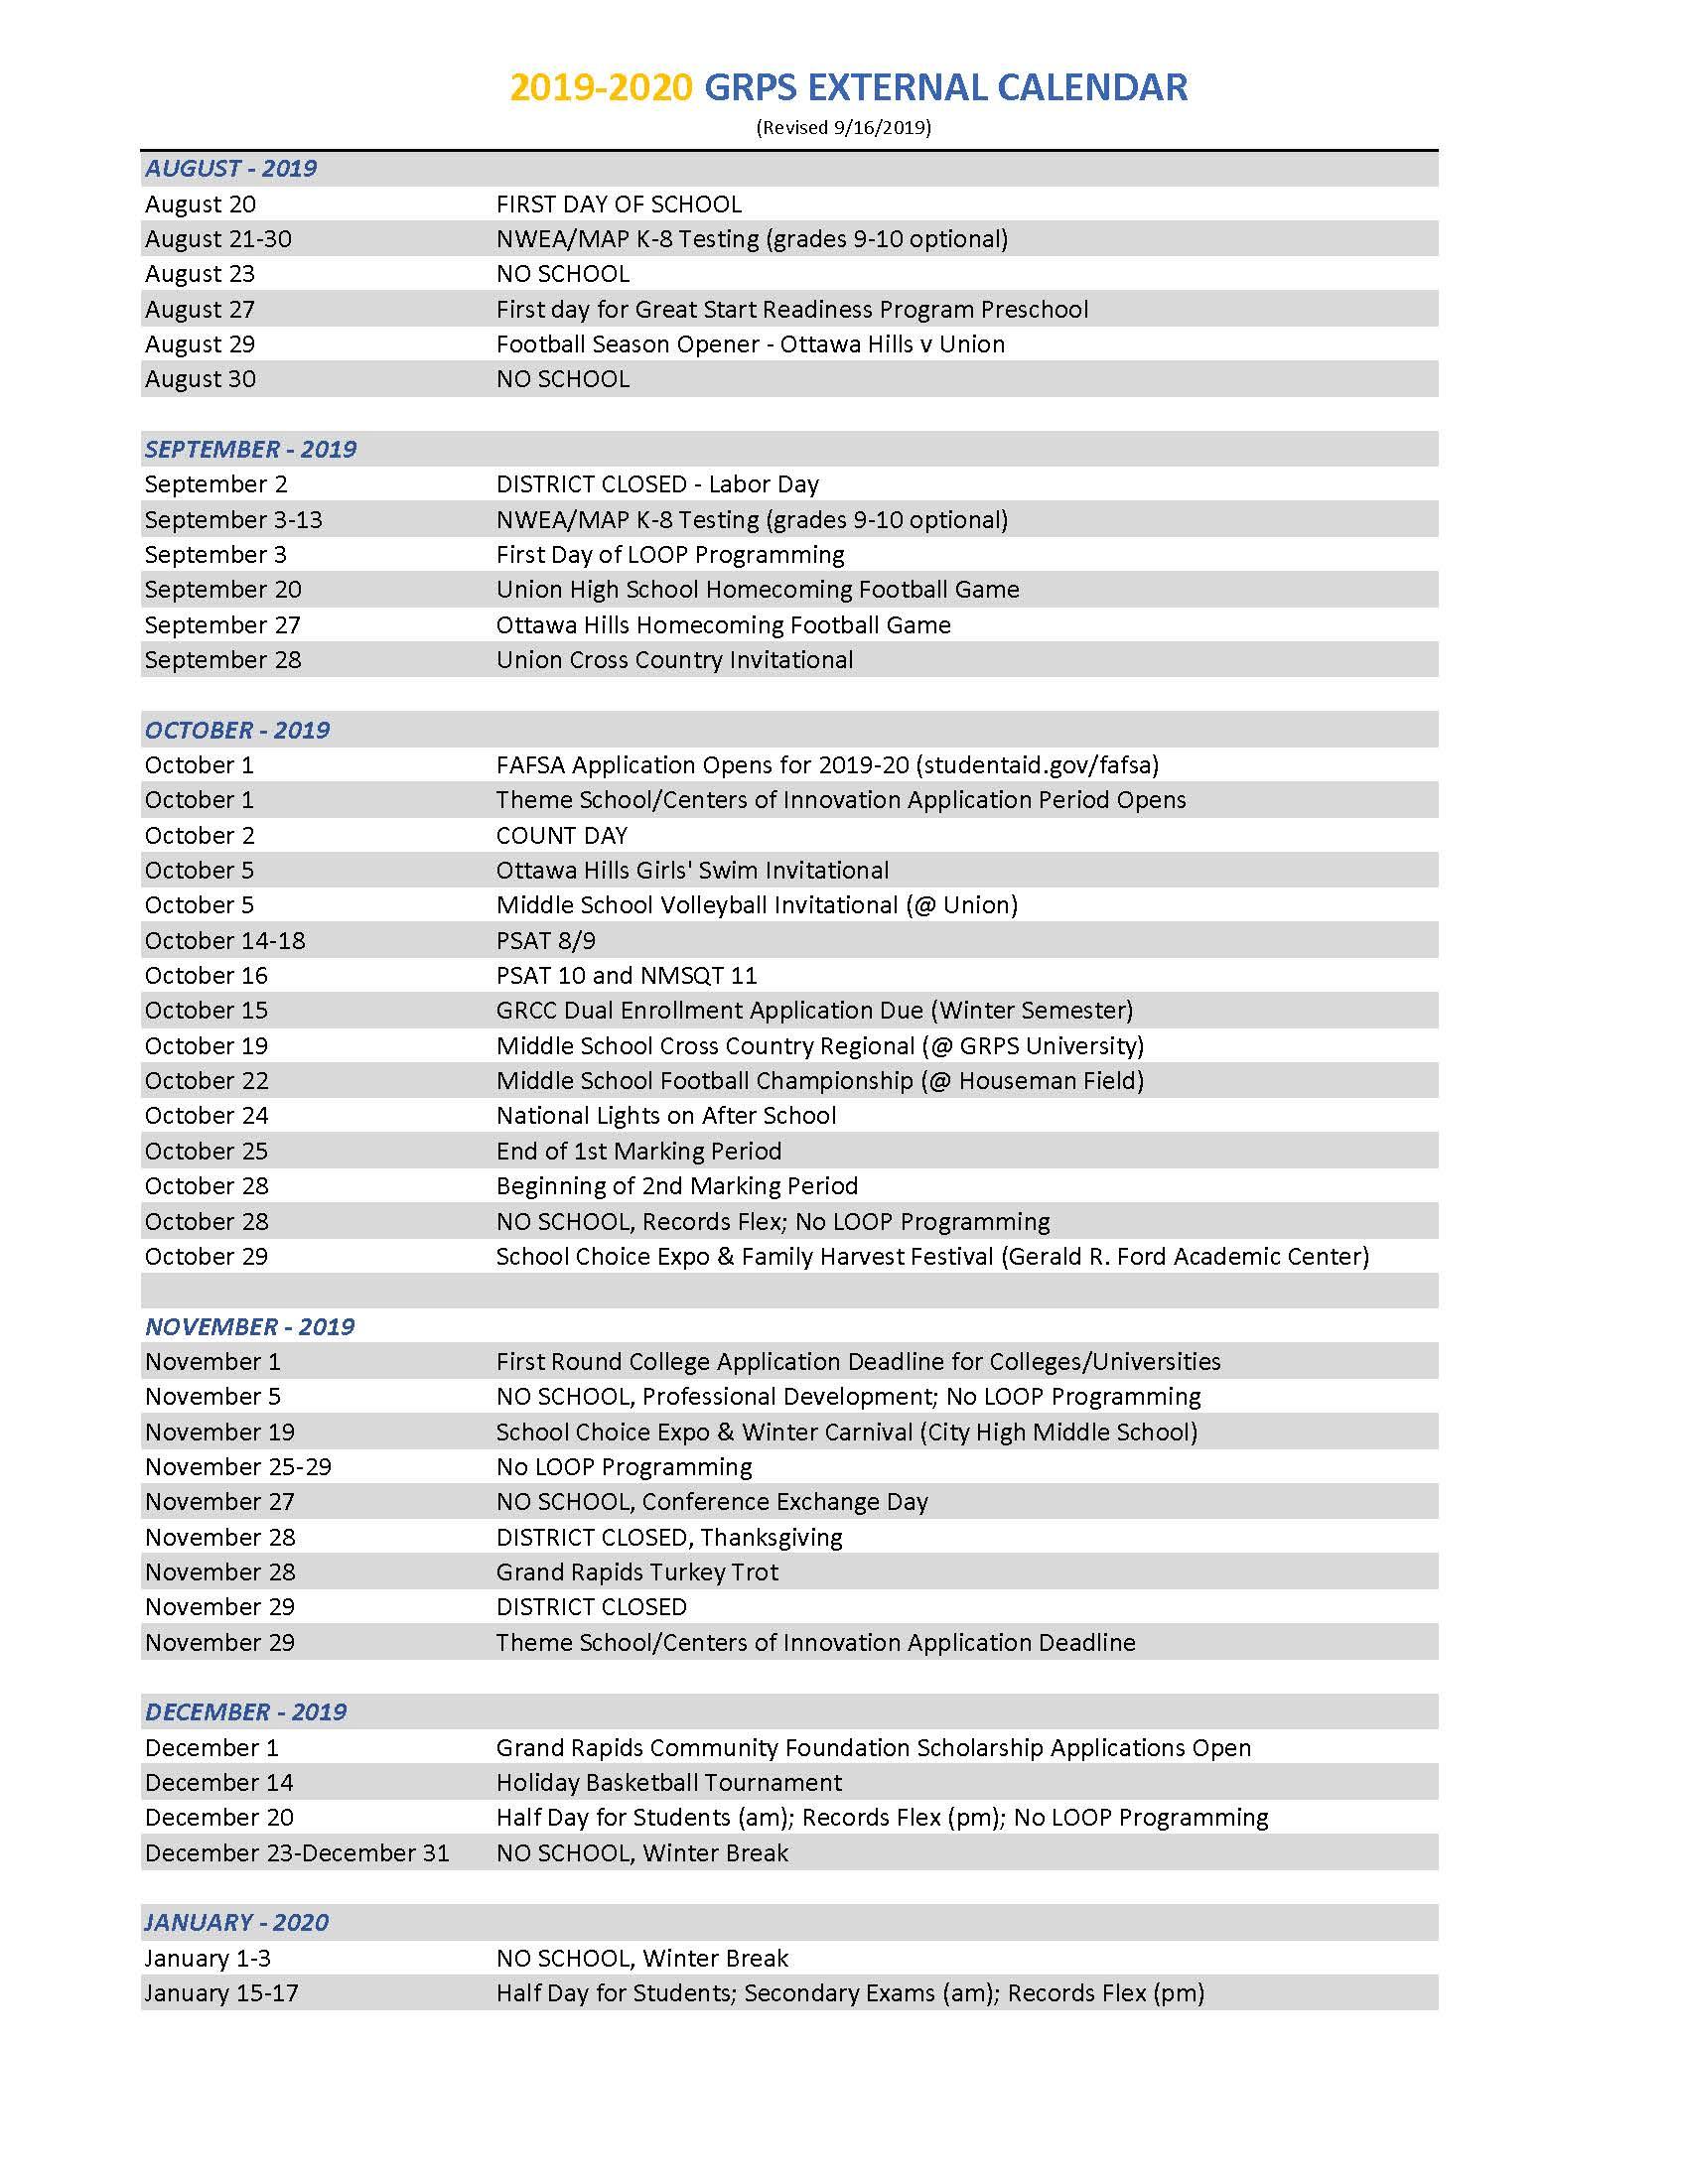 2019 2020 District Calendar Regarding Grand Rapids Public School Calendar